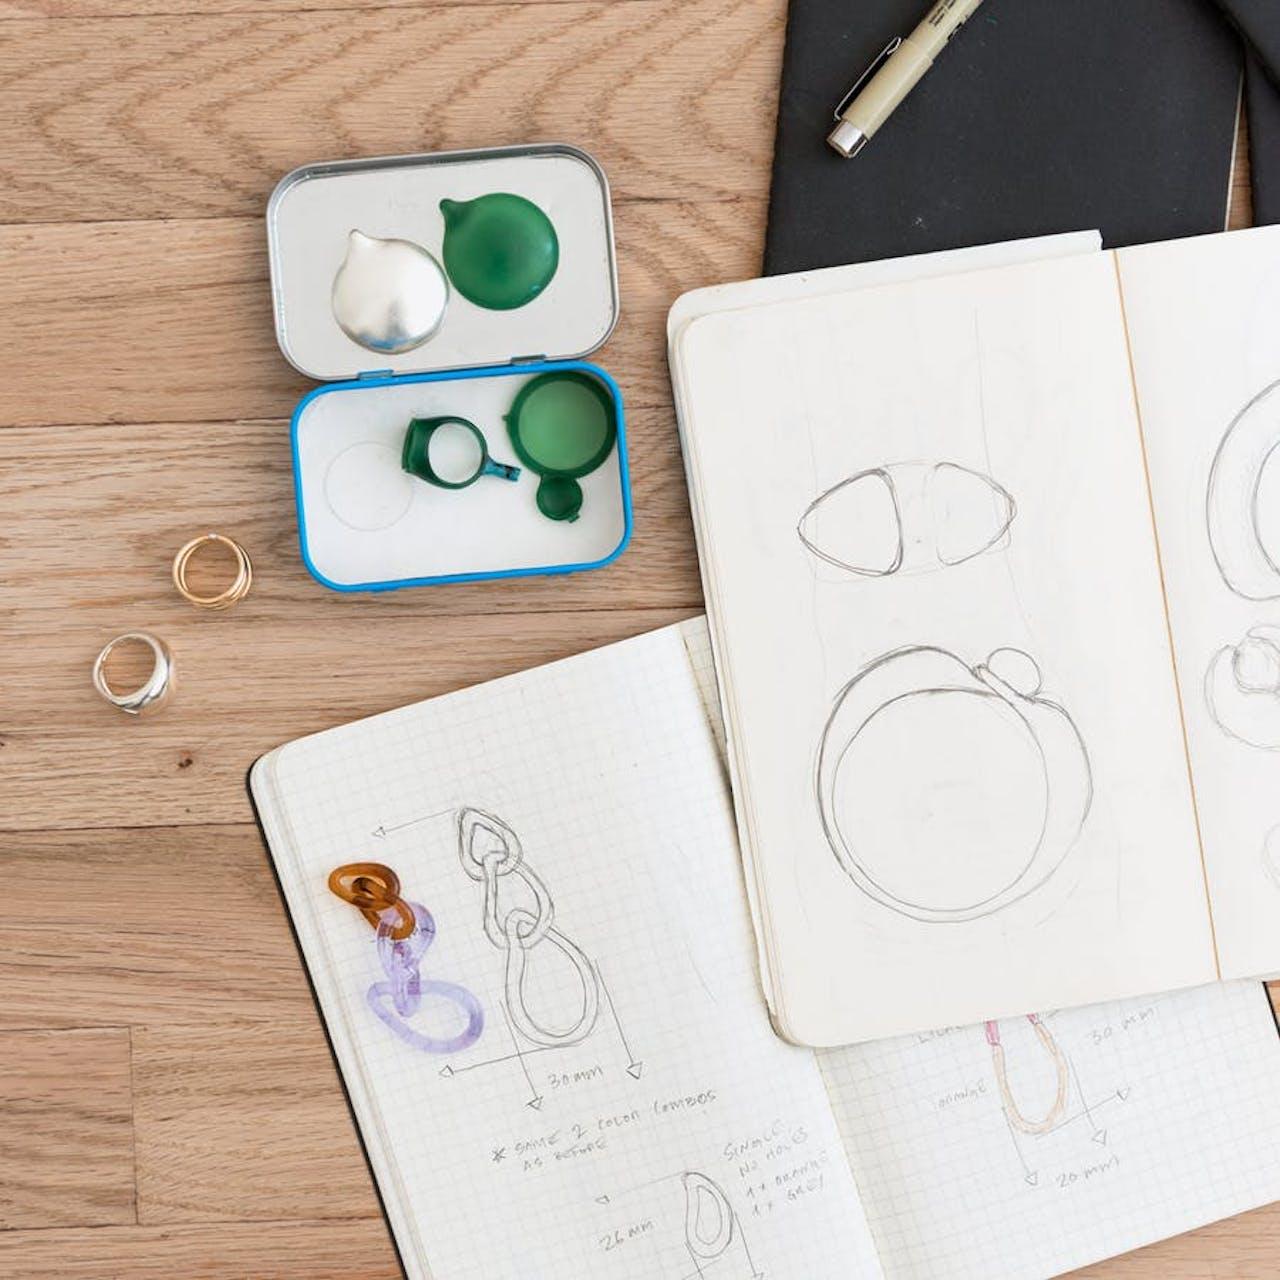 Schmuck Inspiration Magazin Brands & Designer